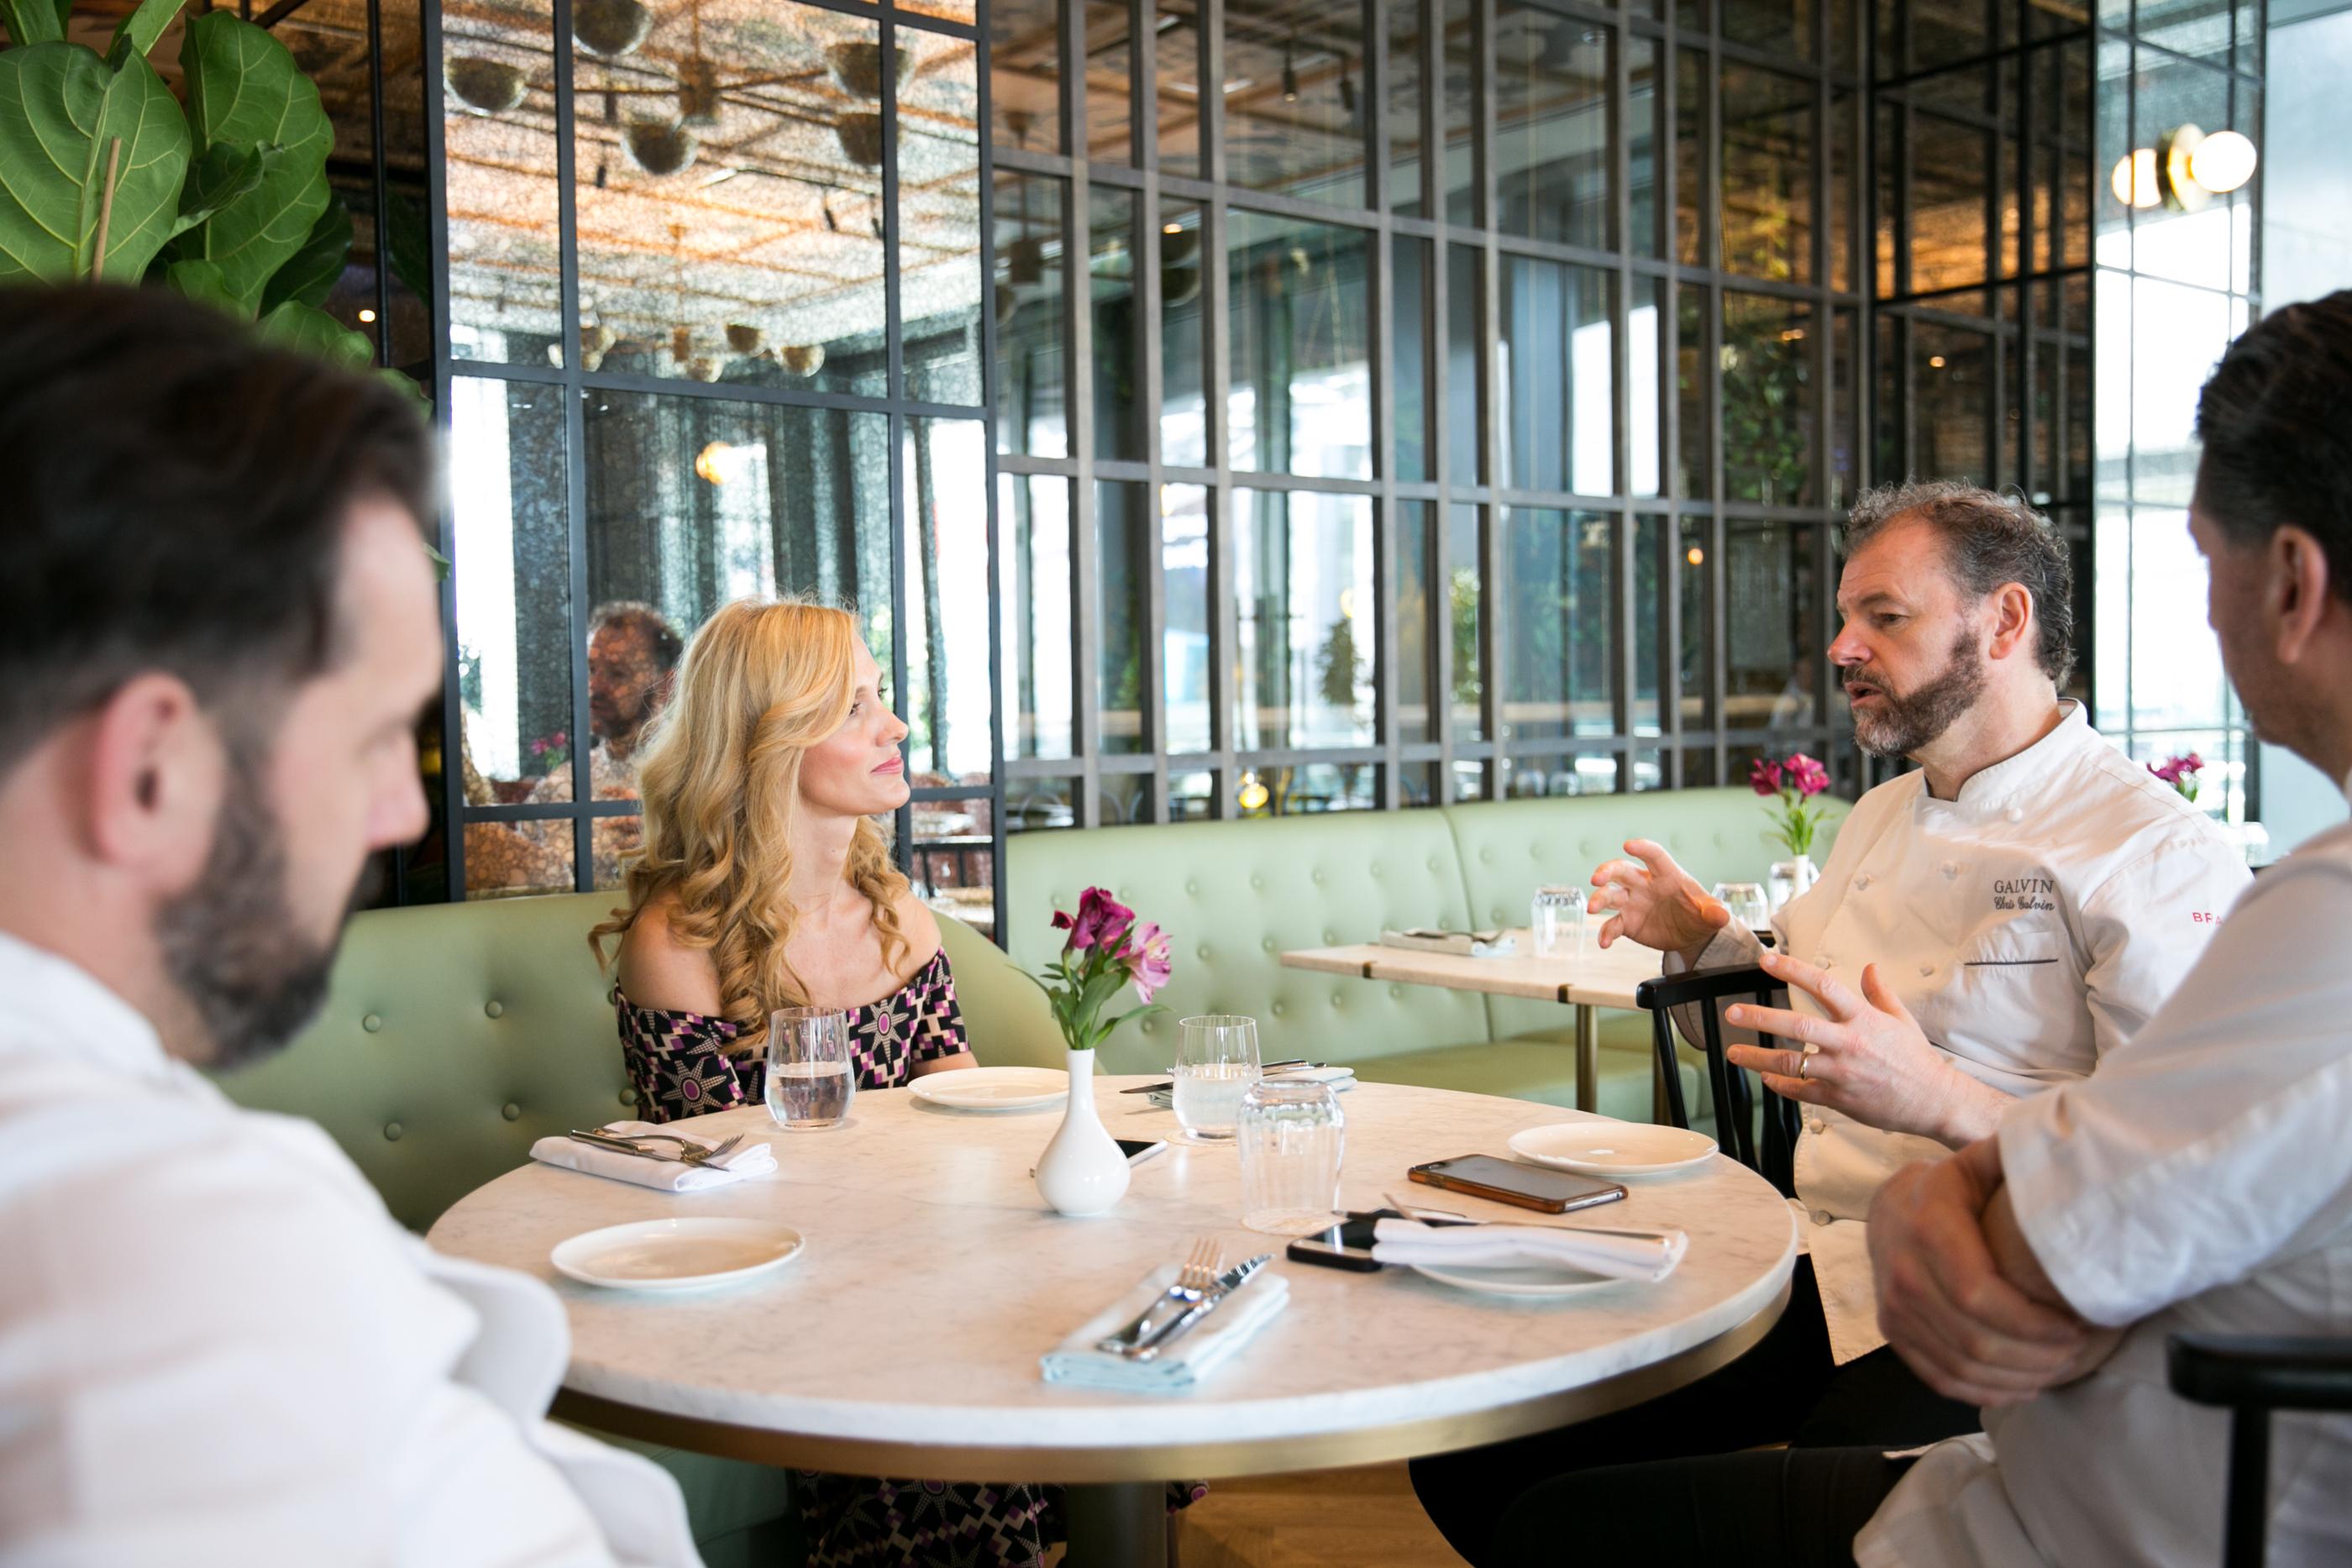 Lidija in conversation with the Galvi brothers Demoiselle DXB.jpg